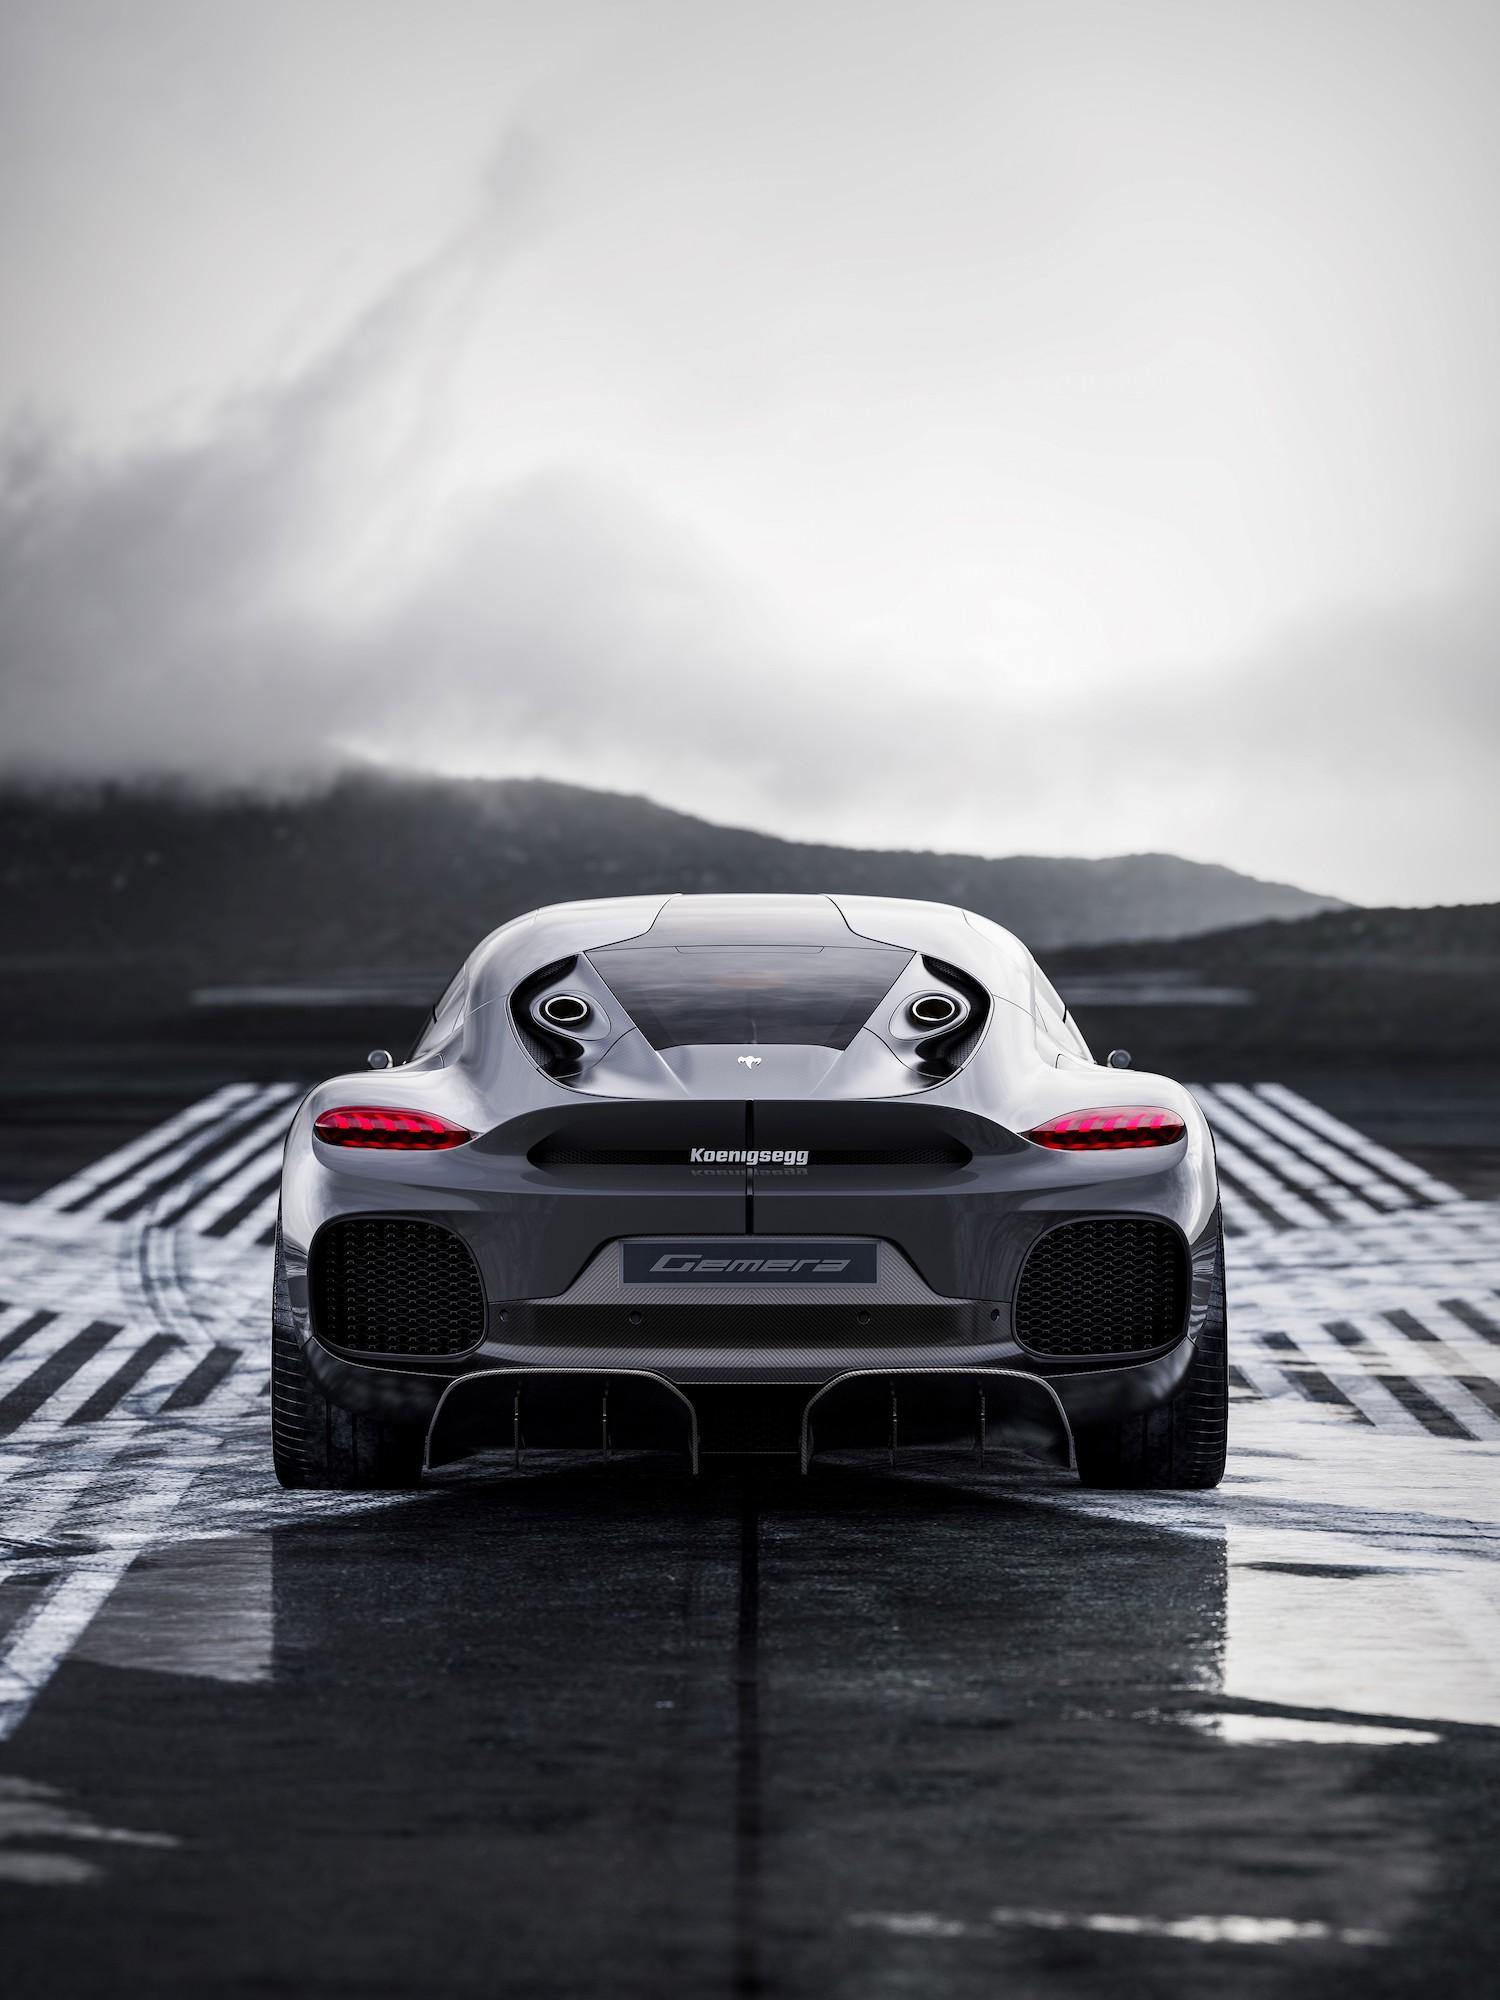 Koenigsegg gemera rear